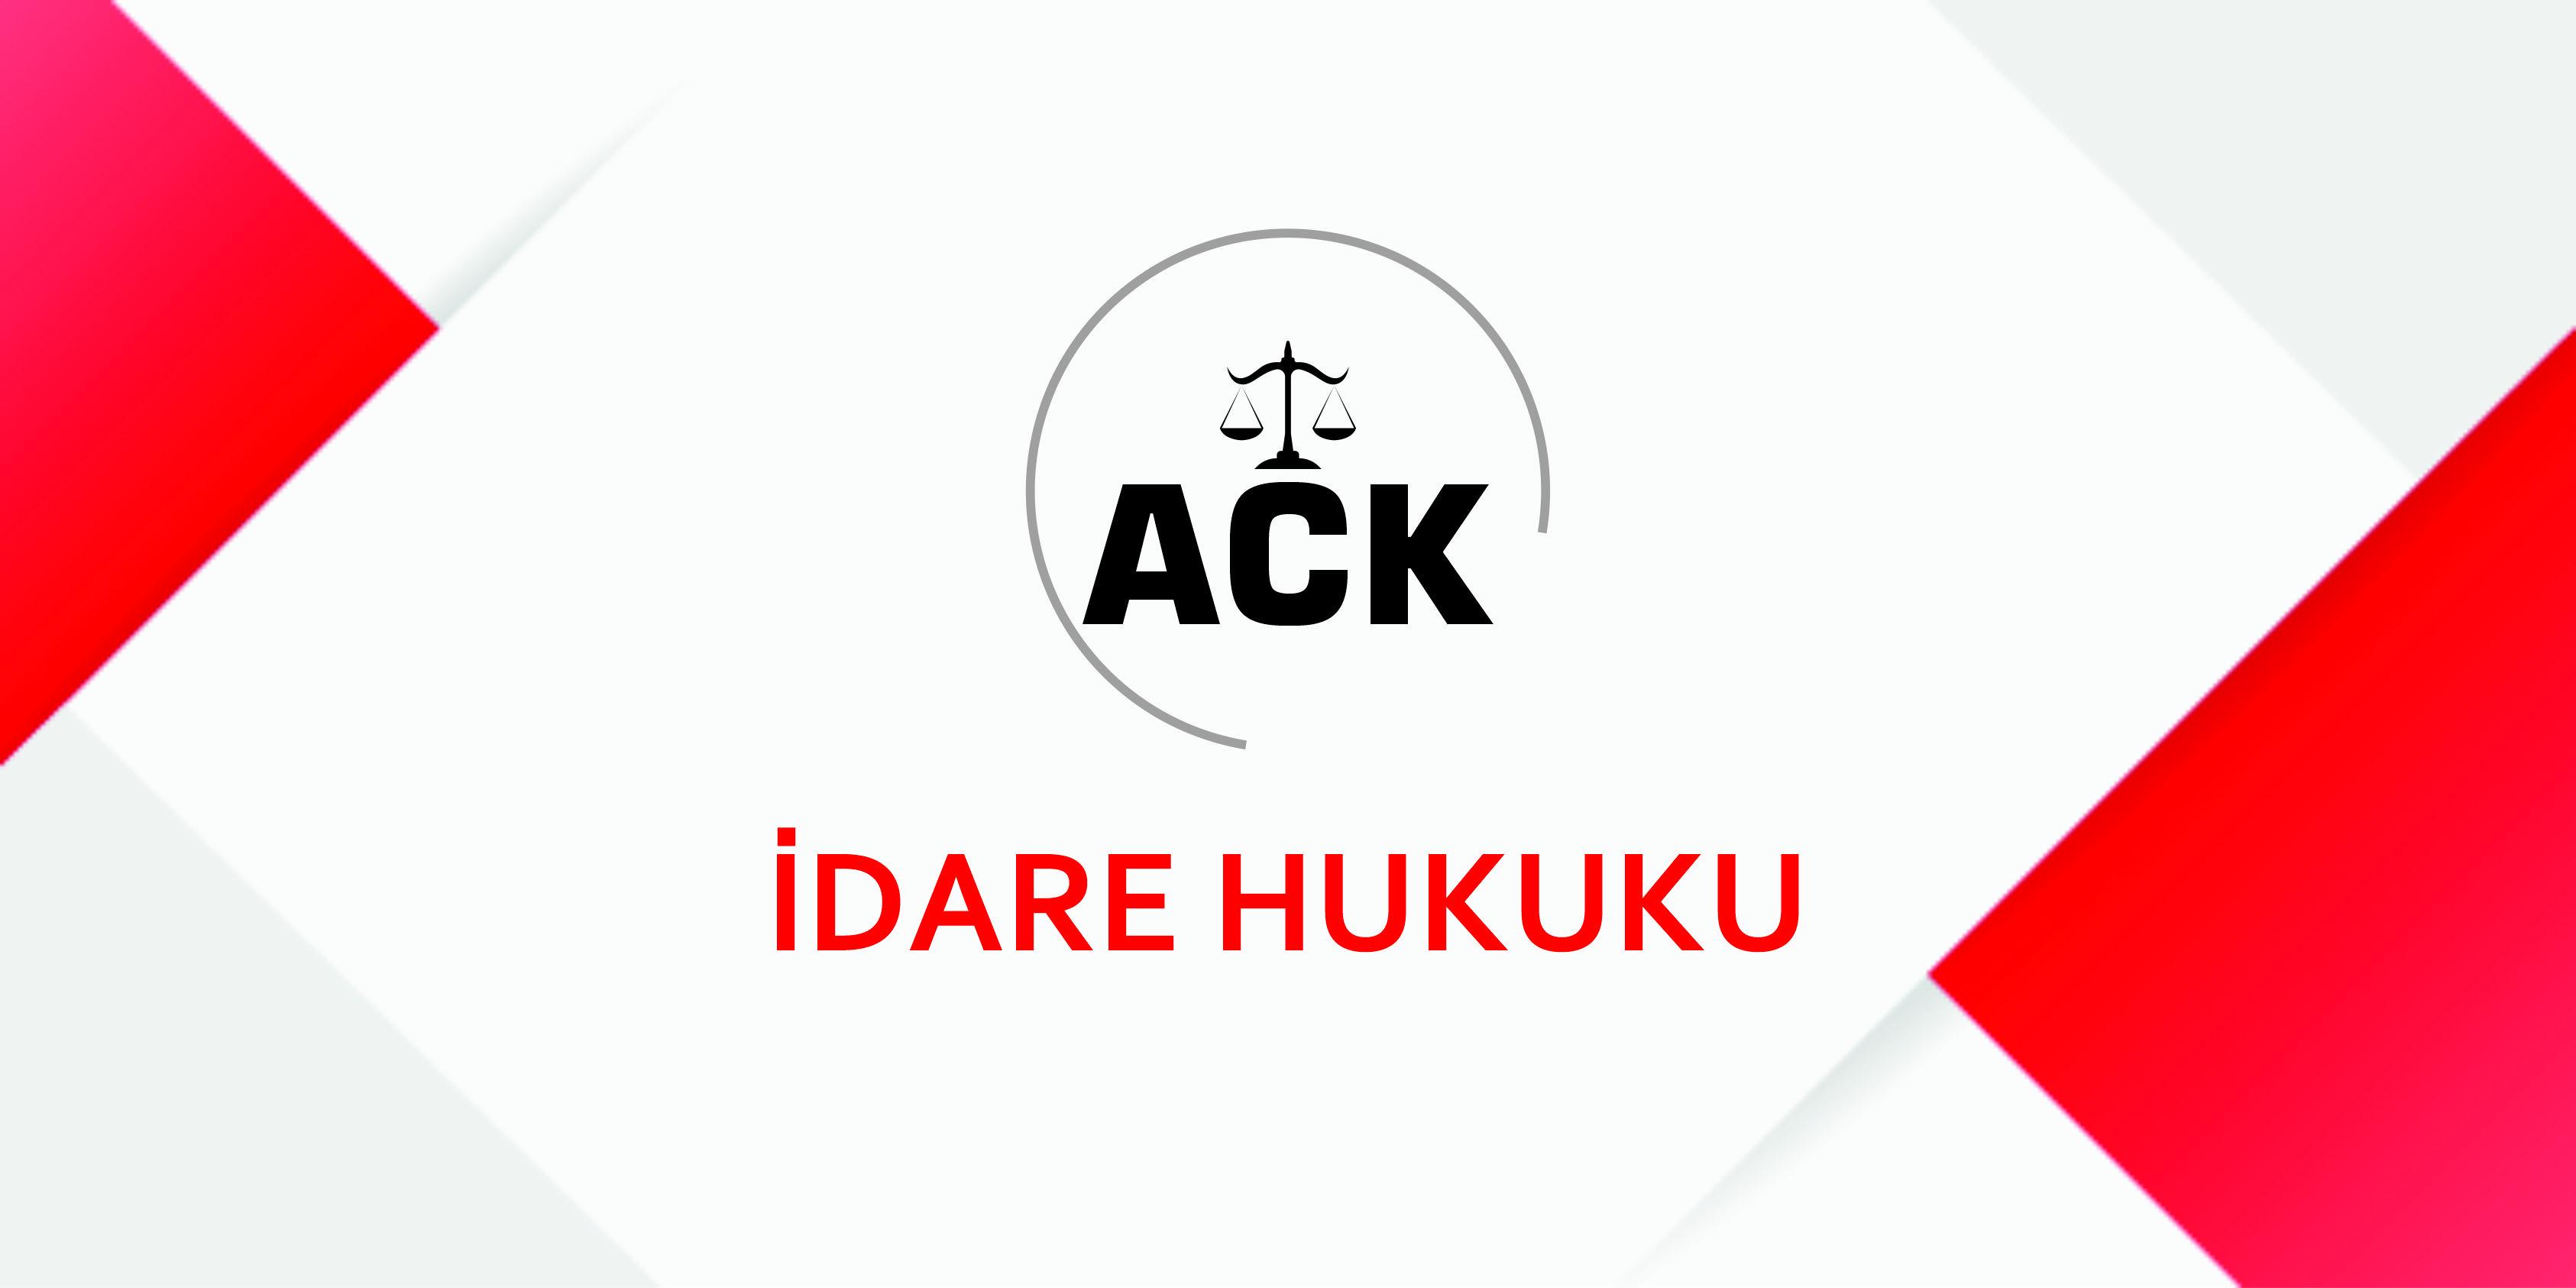 Gaziantep İdare Hukuku Avukatı Aziz Cihan KAÇIRAN